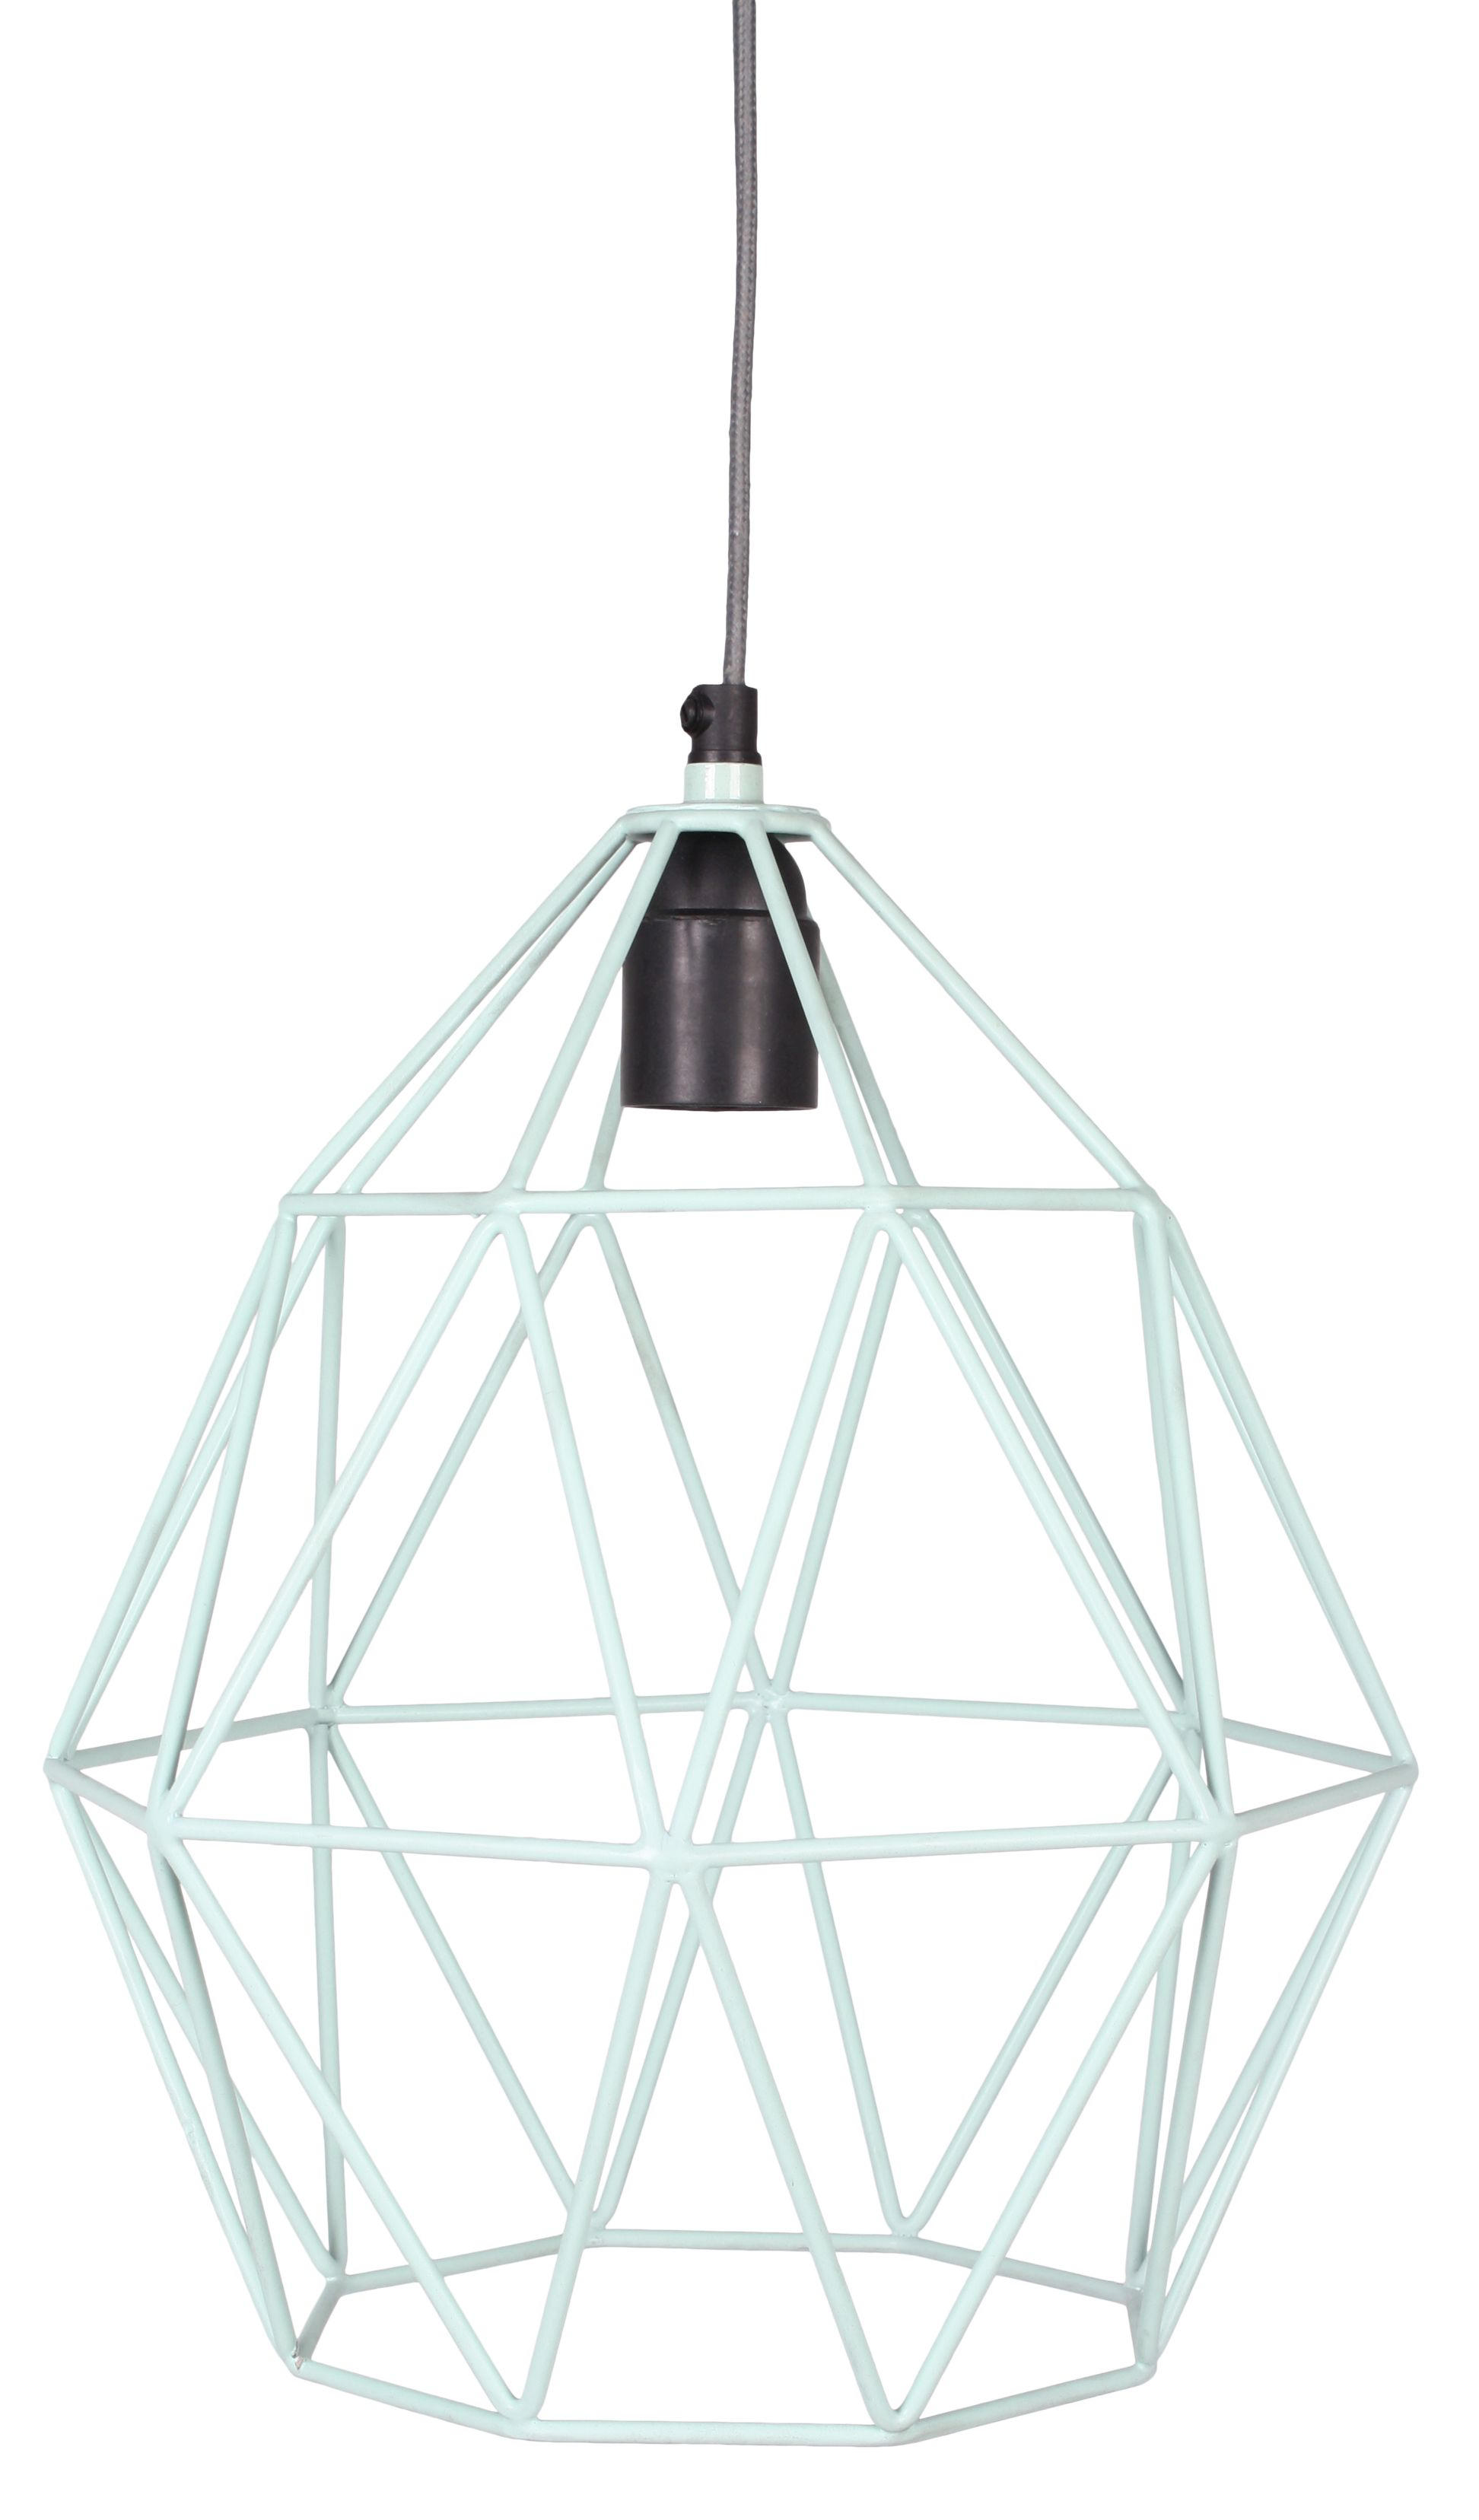 Leuke Hanglamp Voor Tienerkamer.Wire Lamp Www Kidsdepot Nl Wire Lamp Hanglamp Babykamer